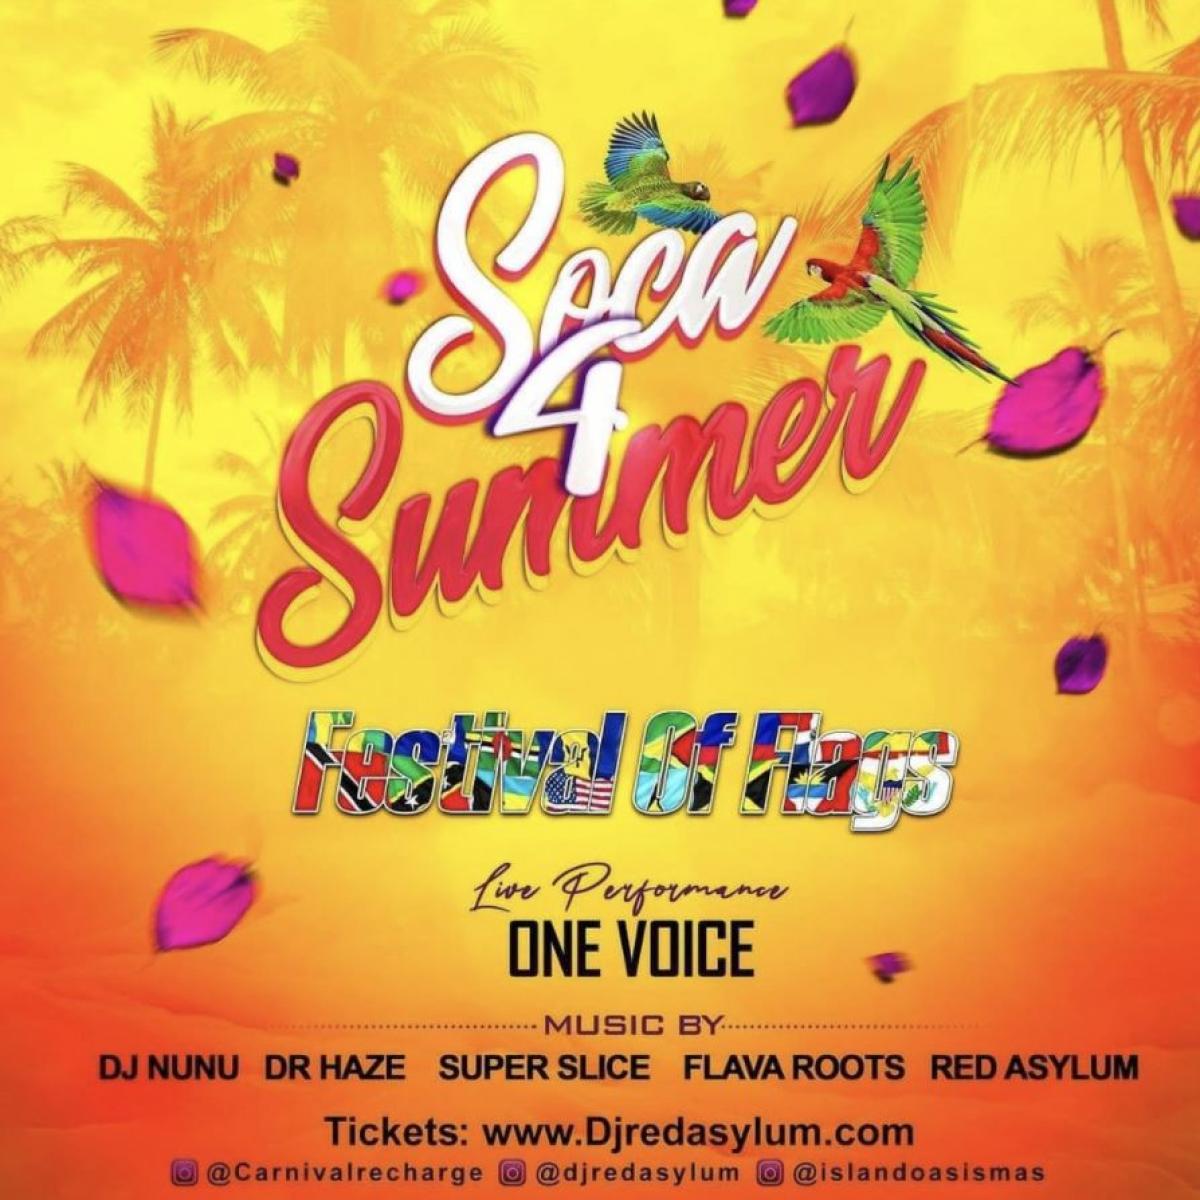 Soca 4 Summer flyer or graphic.